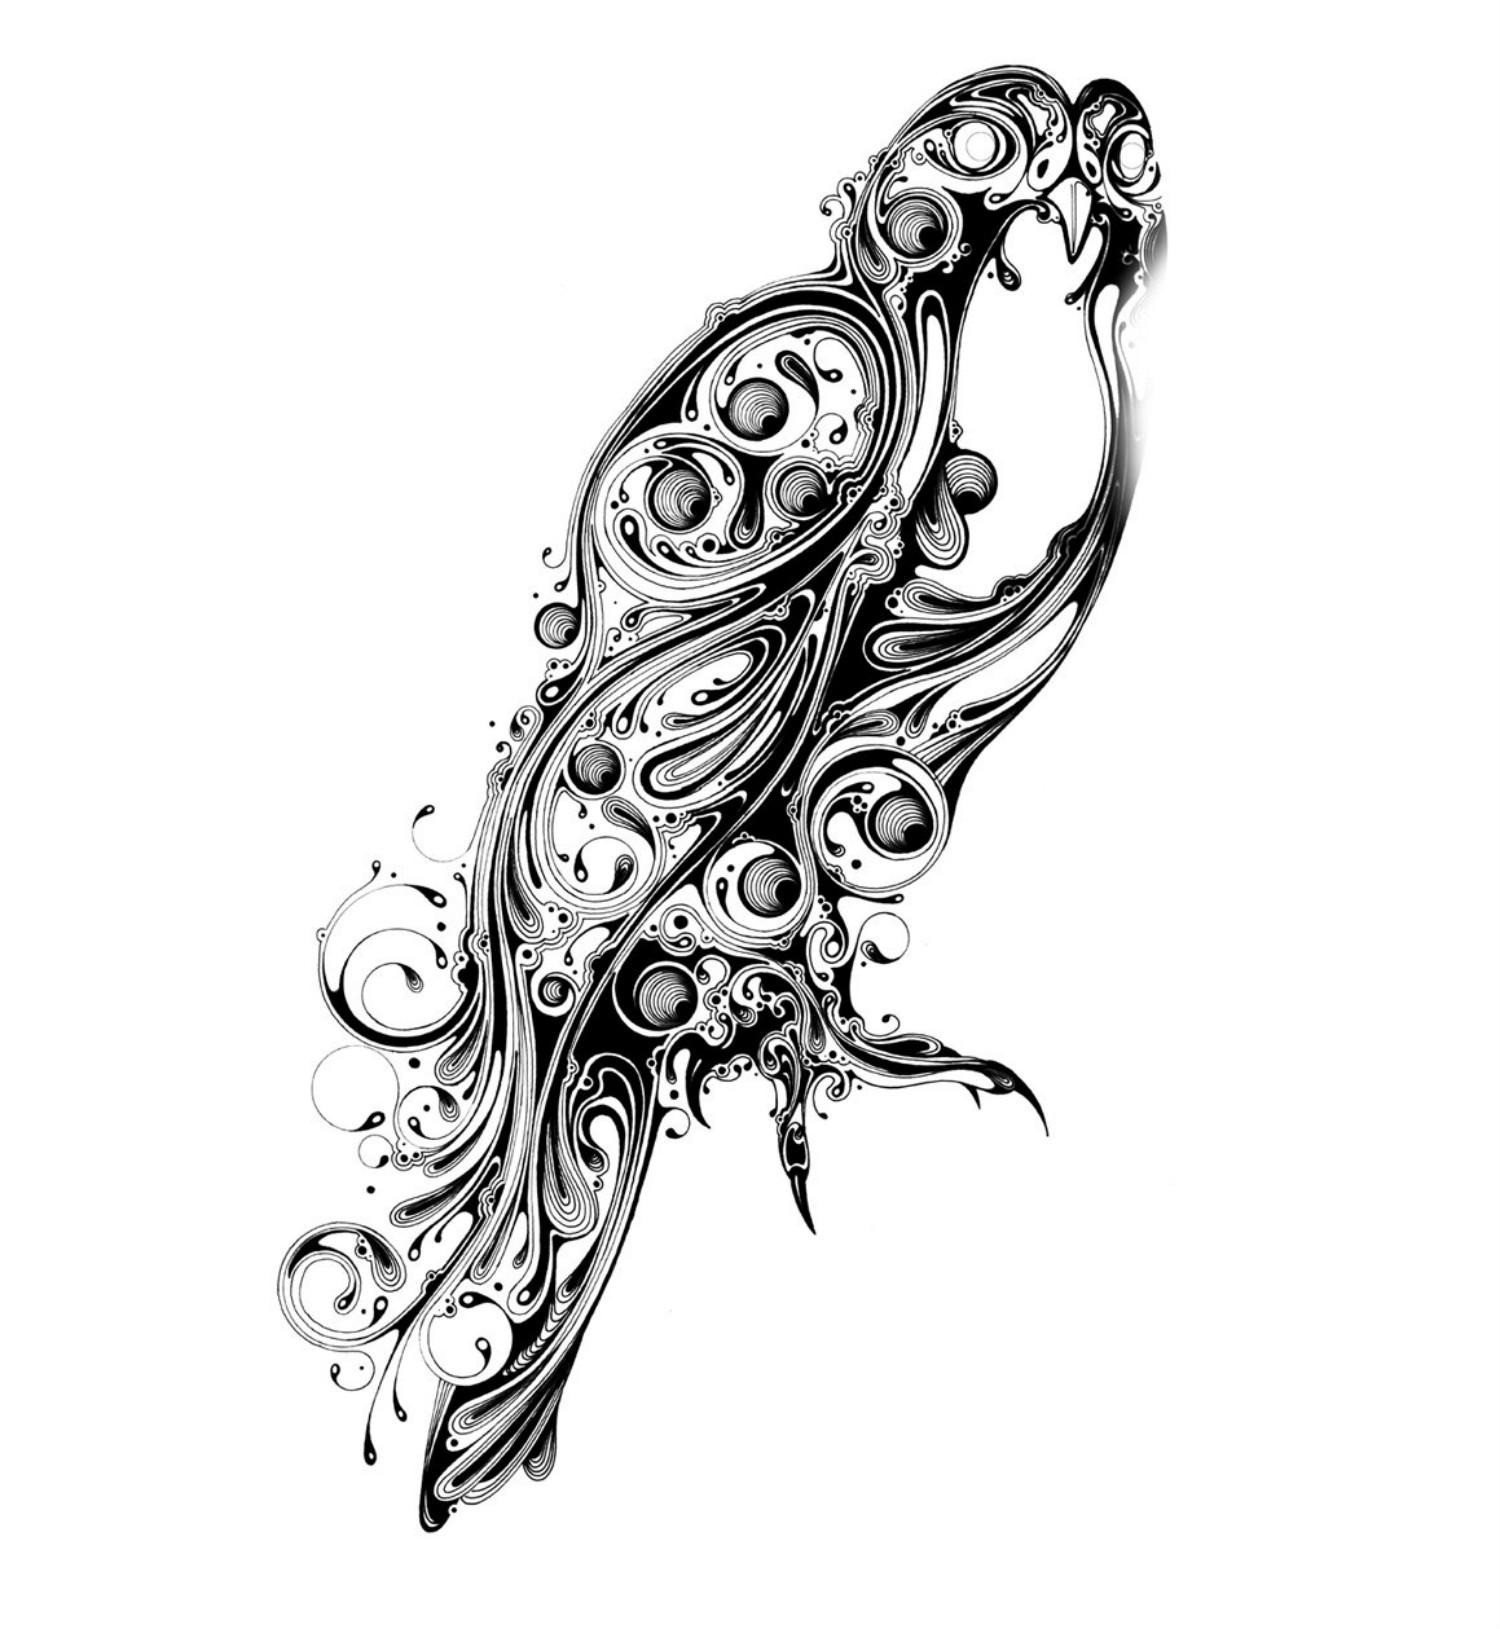 si scott illustration black and white hawk